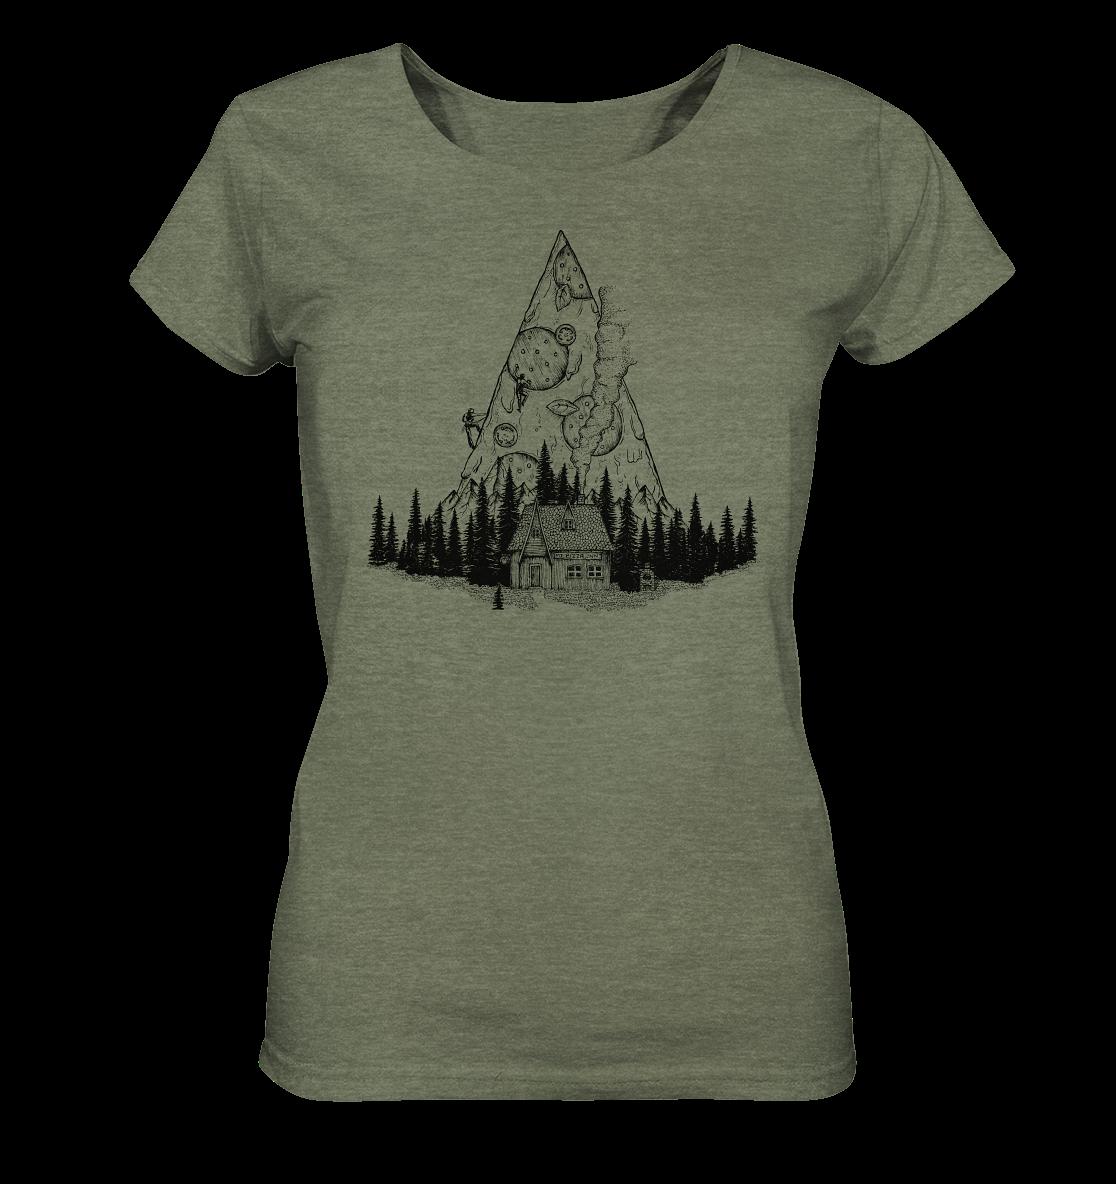 front-ladies-organic-shirt-meliert-616b52-1116x-6.png